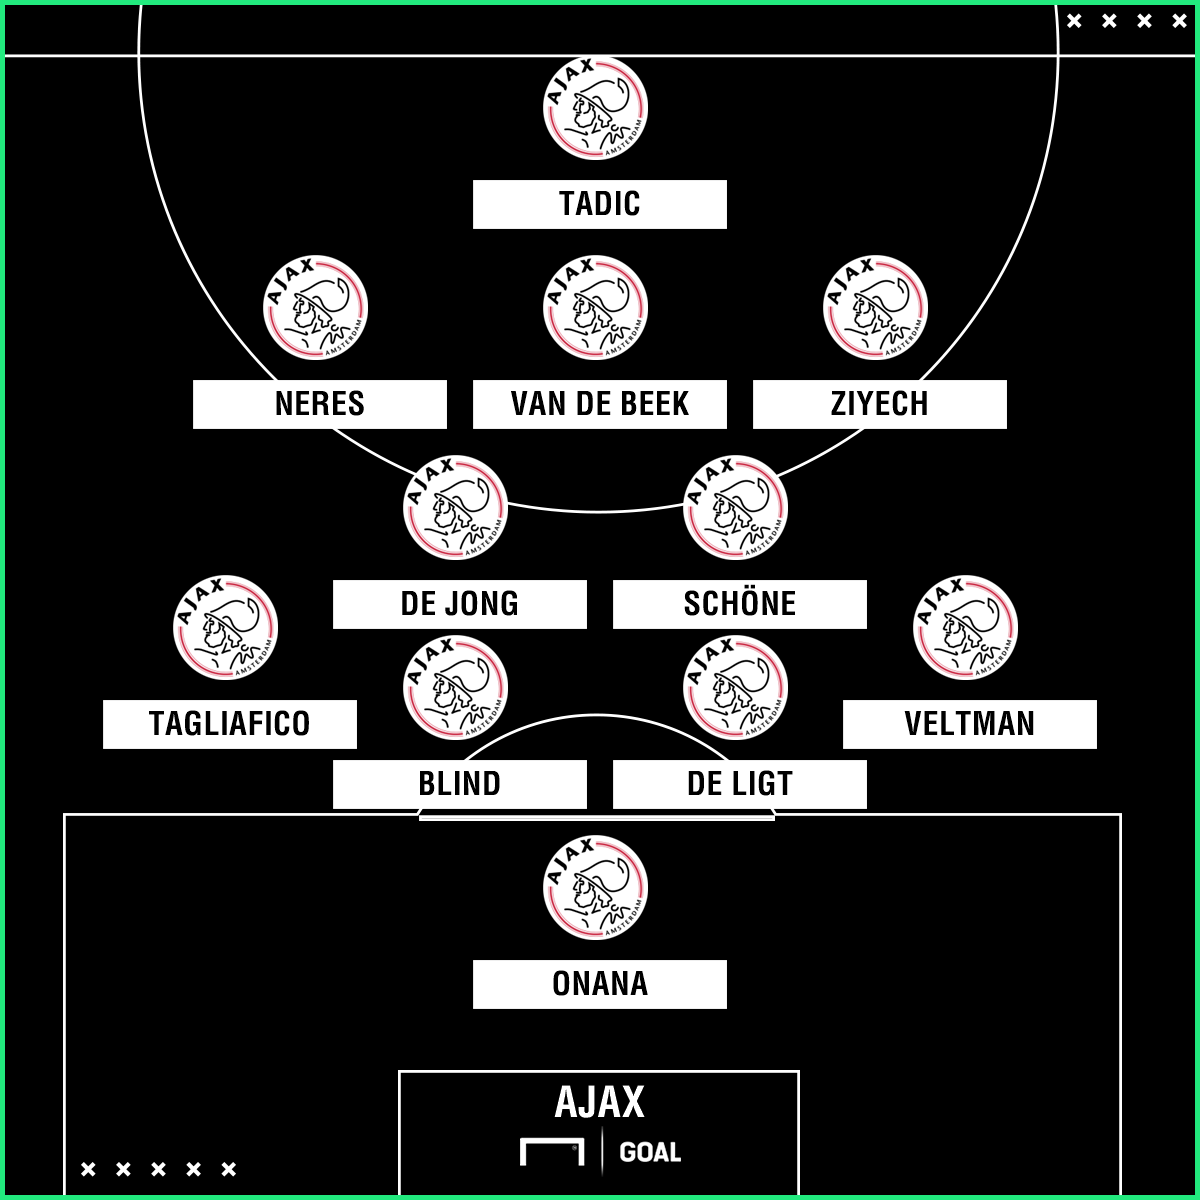 Ajax avversario della Juventus in Champions League: formazione ...